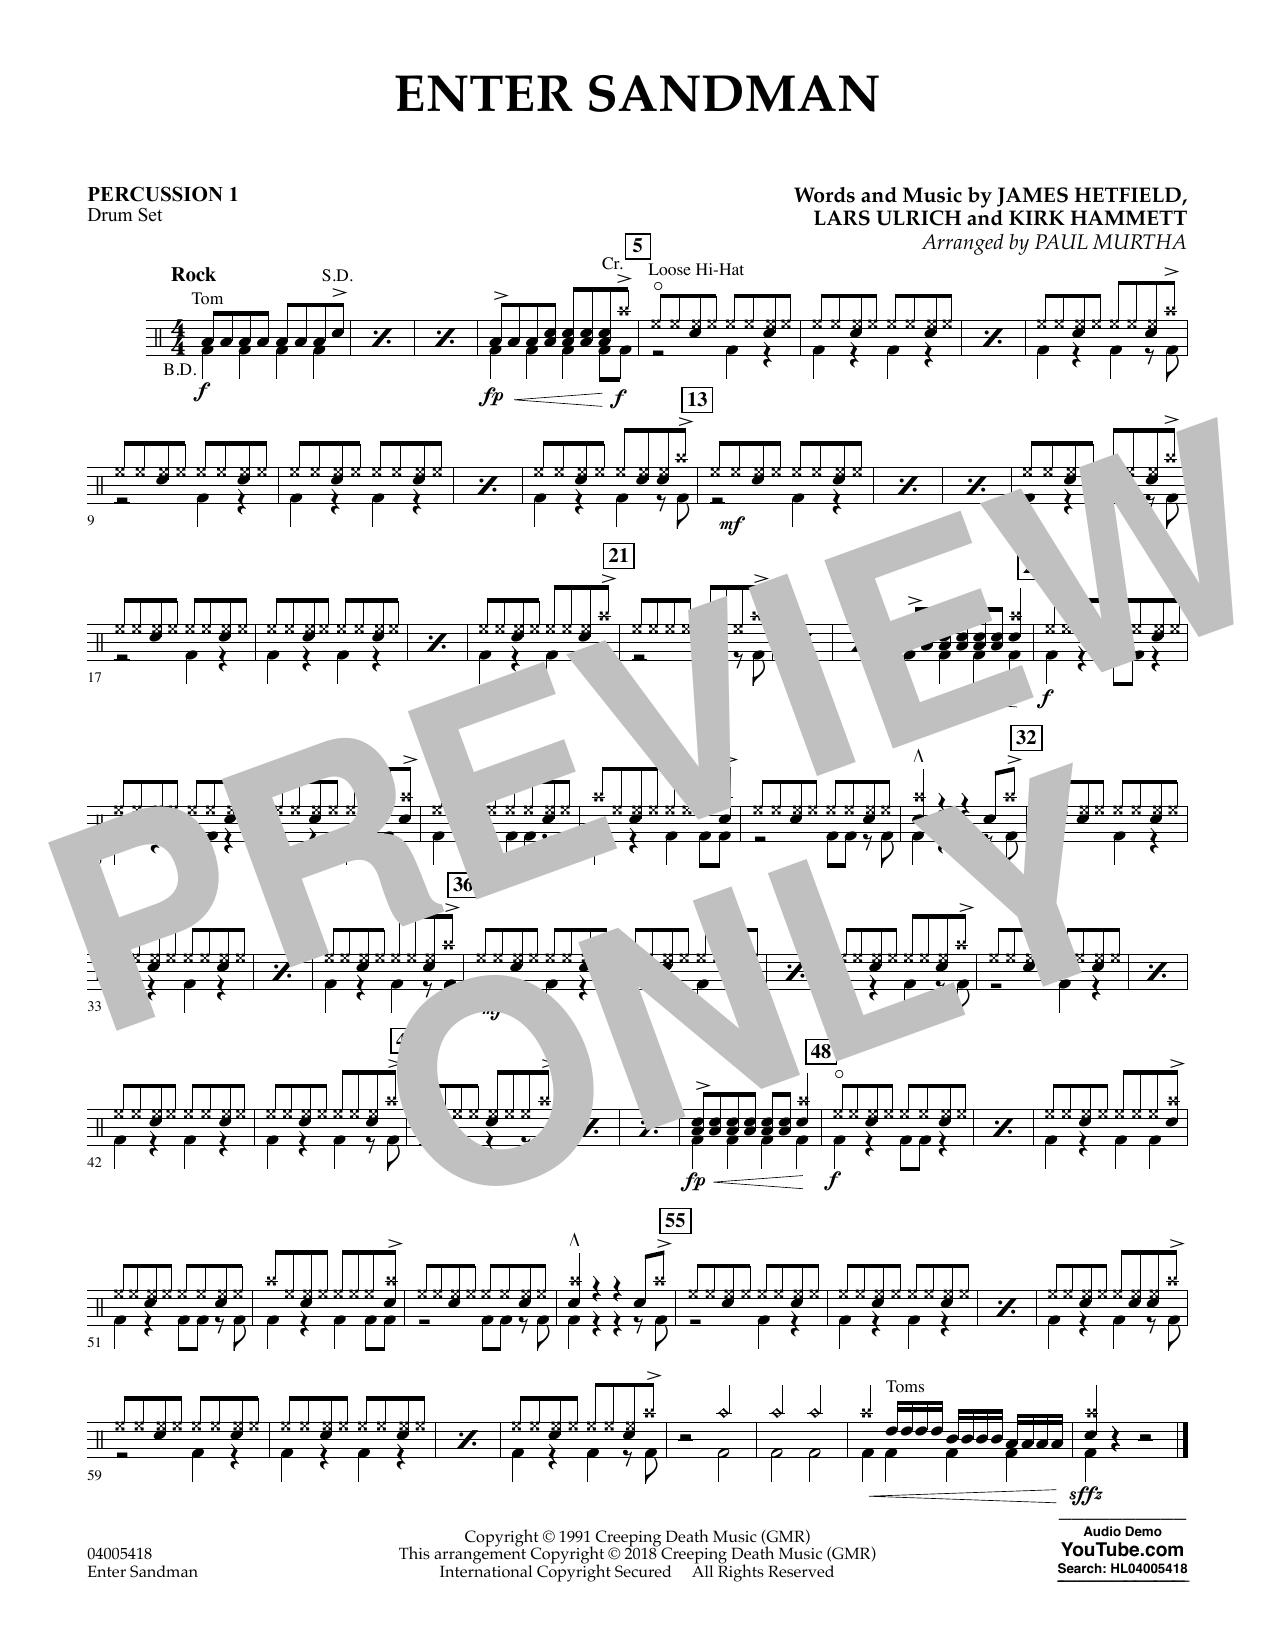 Enter Sandman - Percussion 1 (Concert Band)